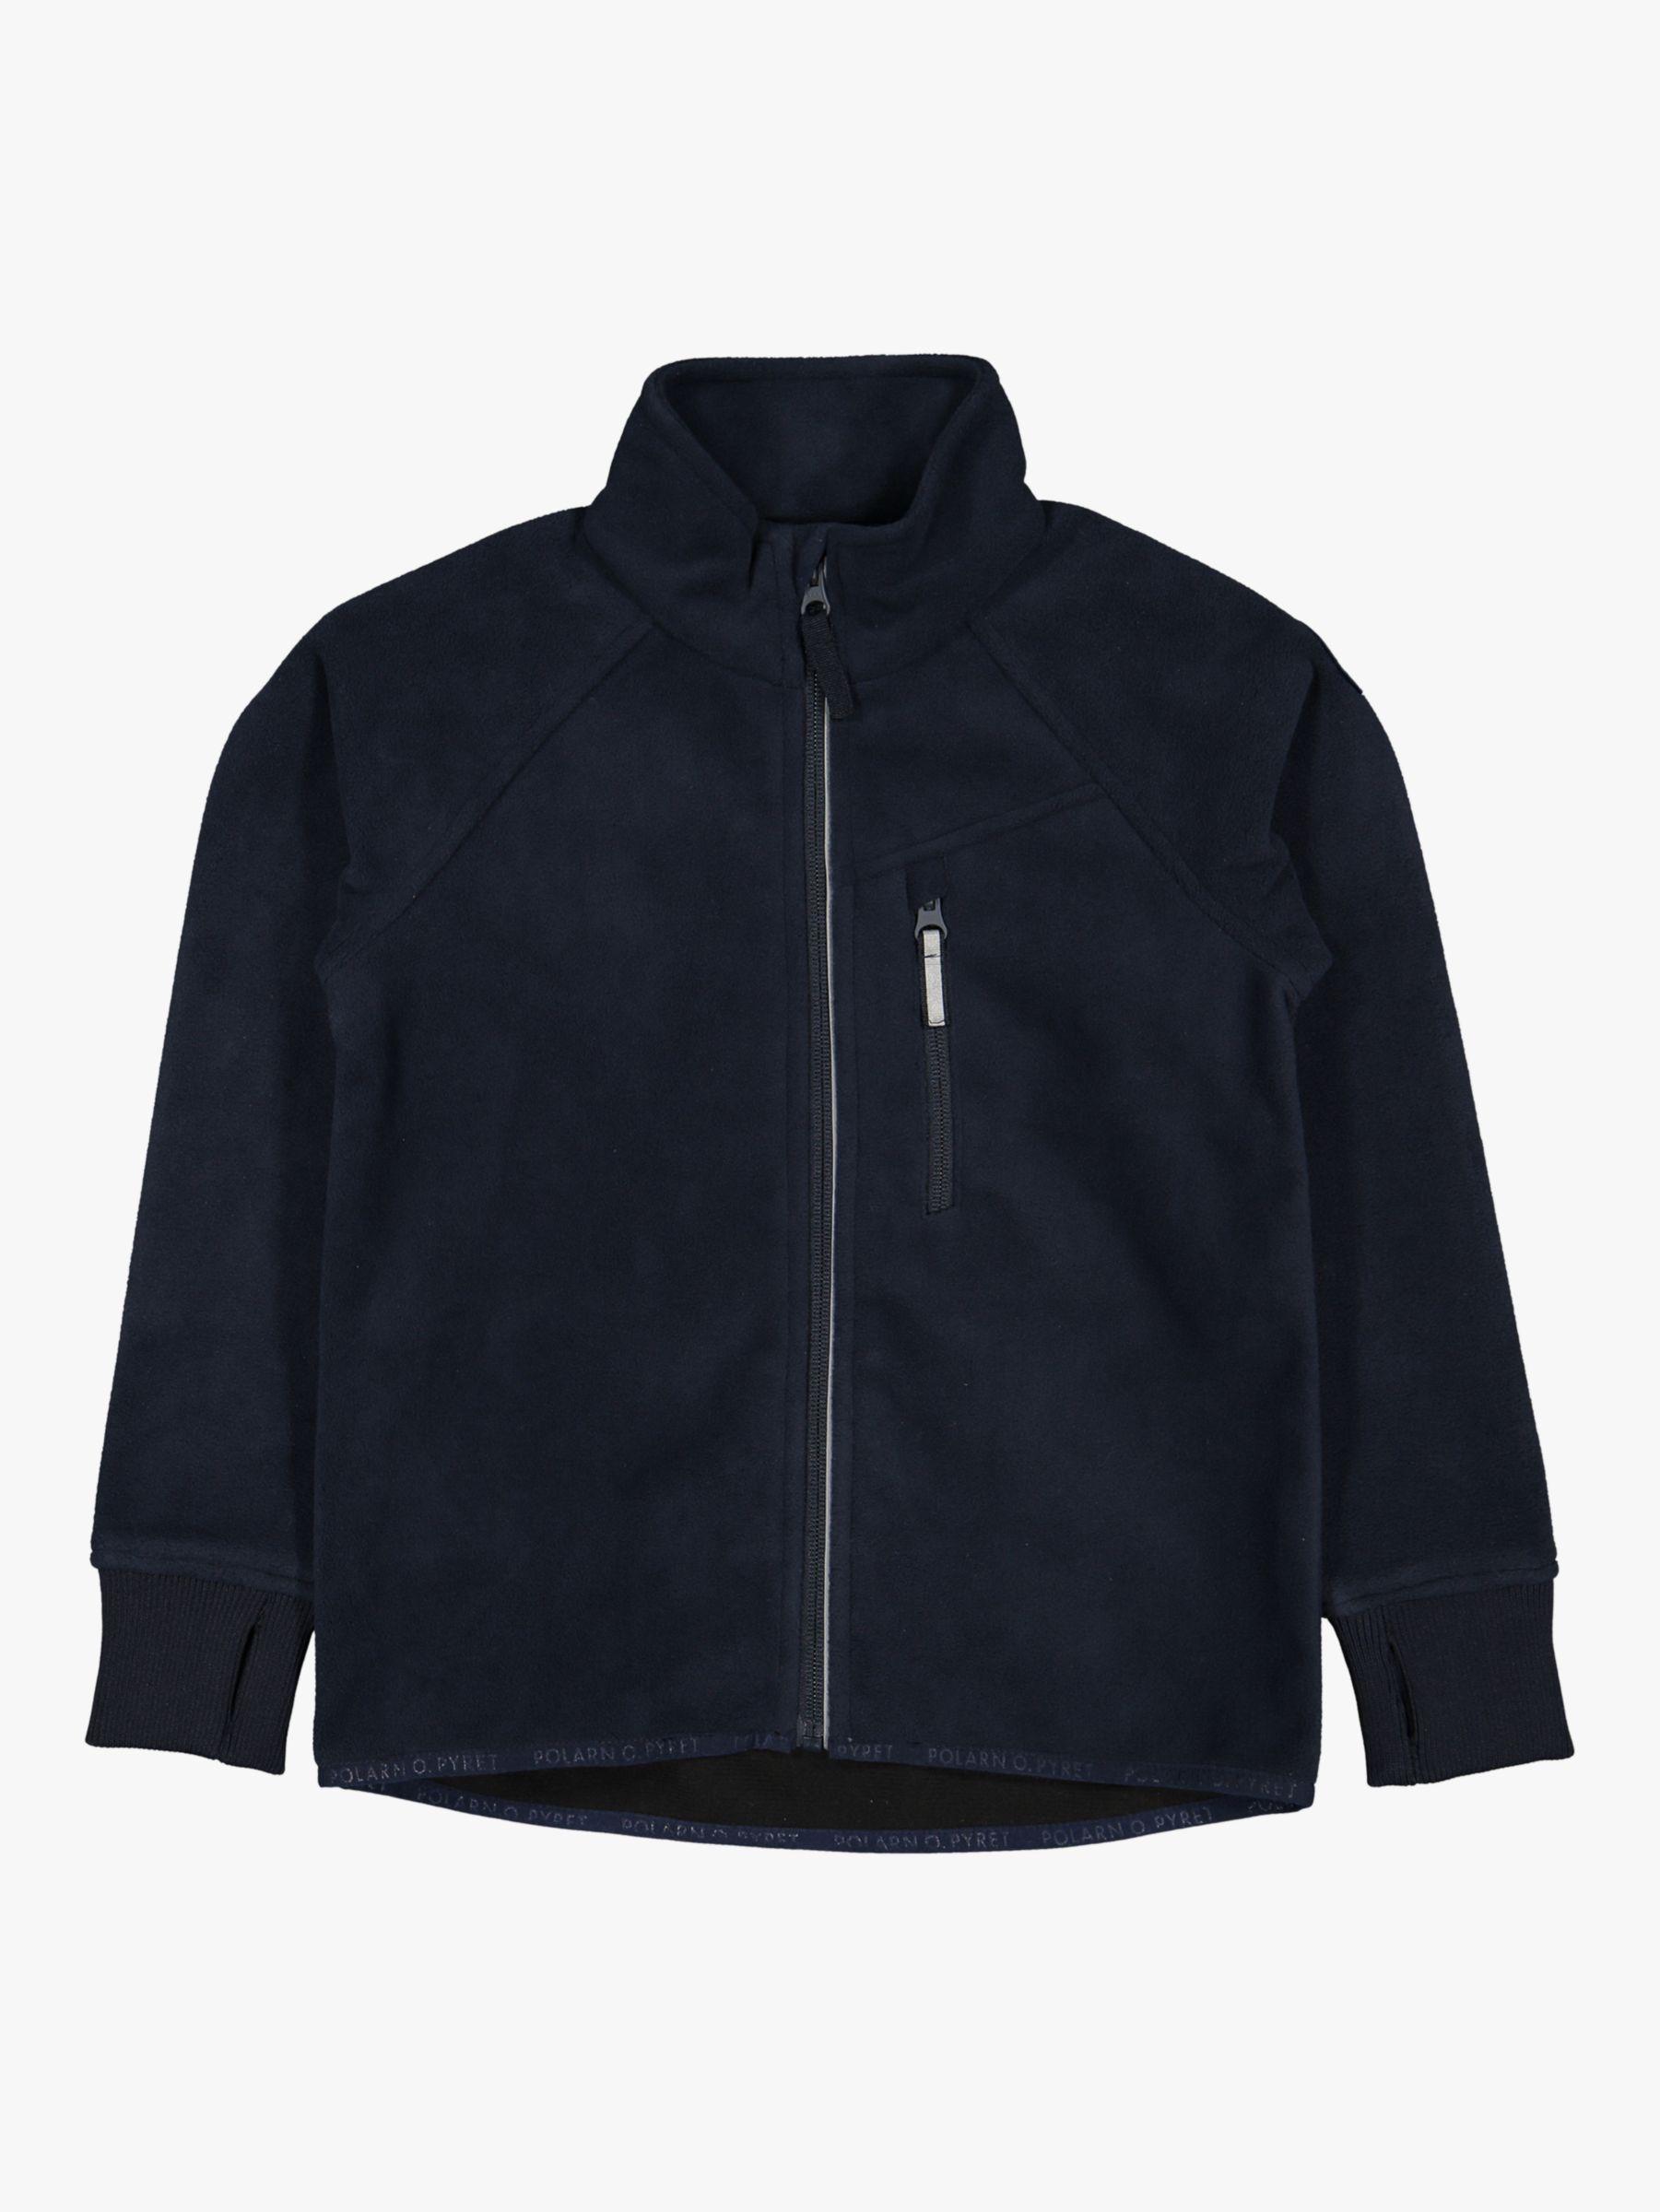 Polarn O. Pyret Polarn O. Pyret Children's Waterproof Fleece Jacket, Dark Sapphire